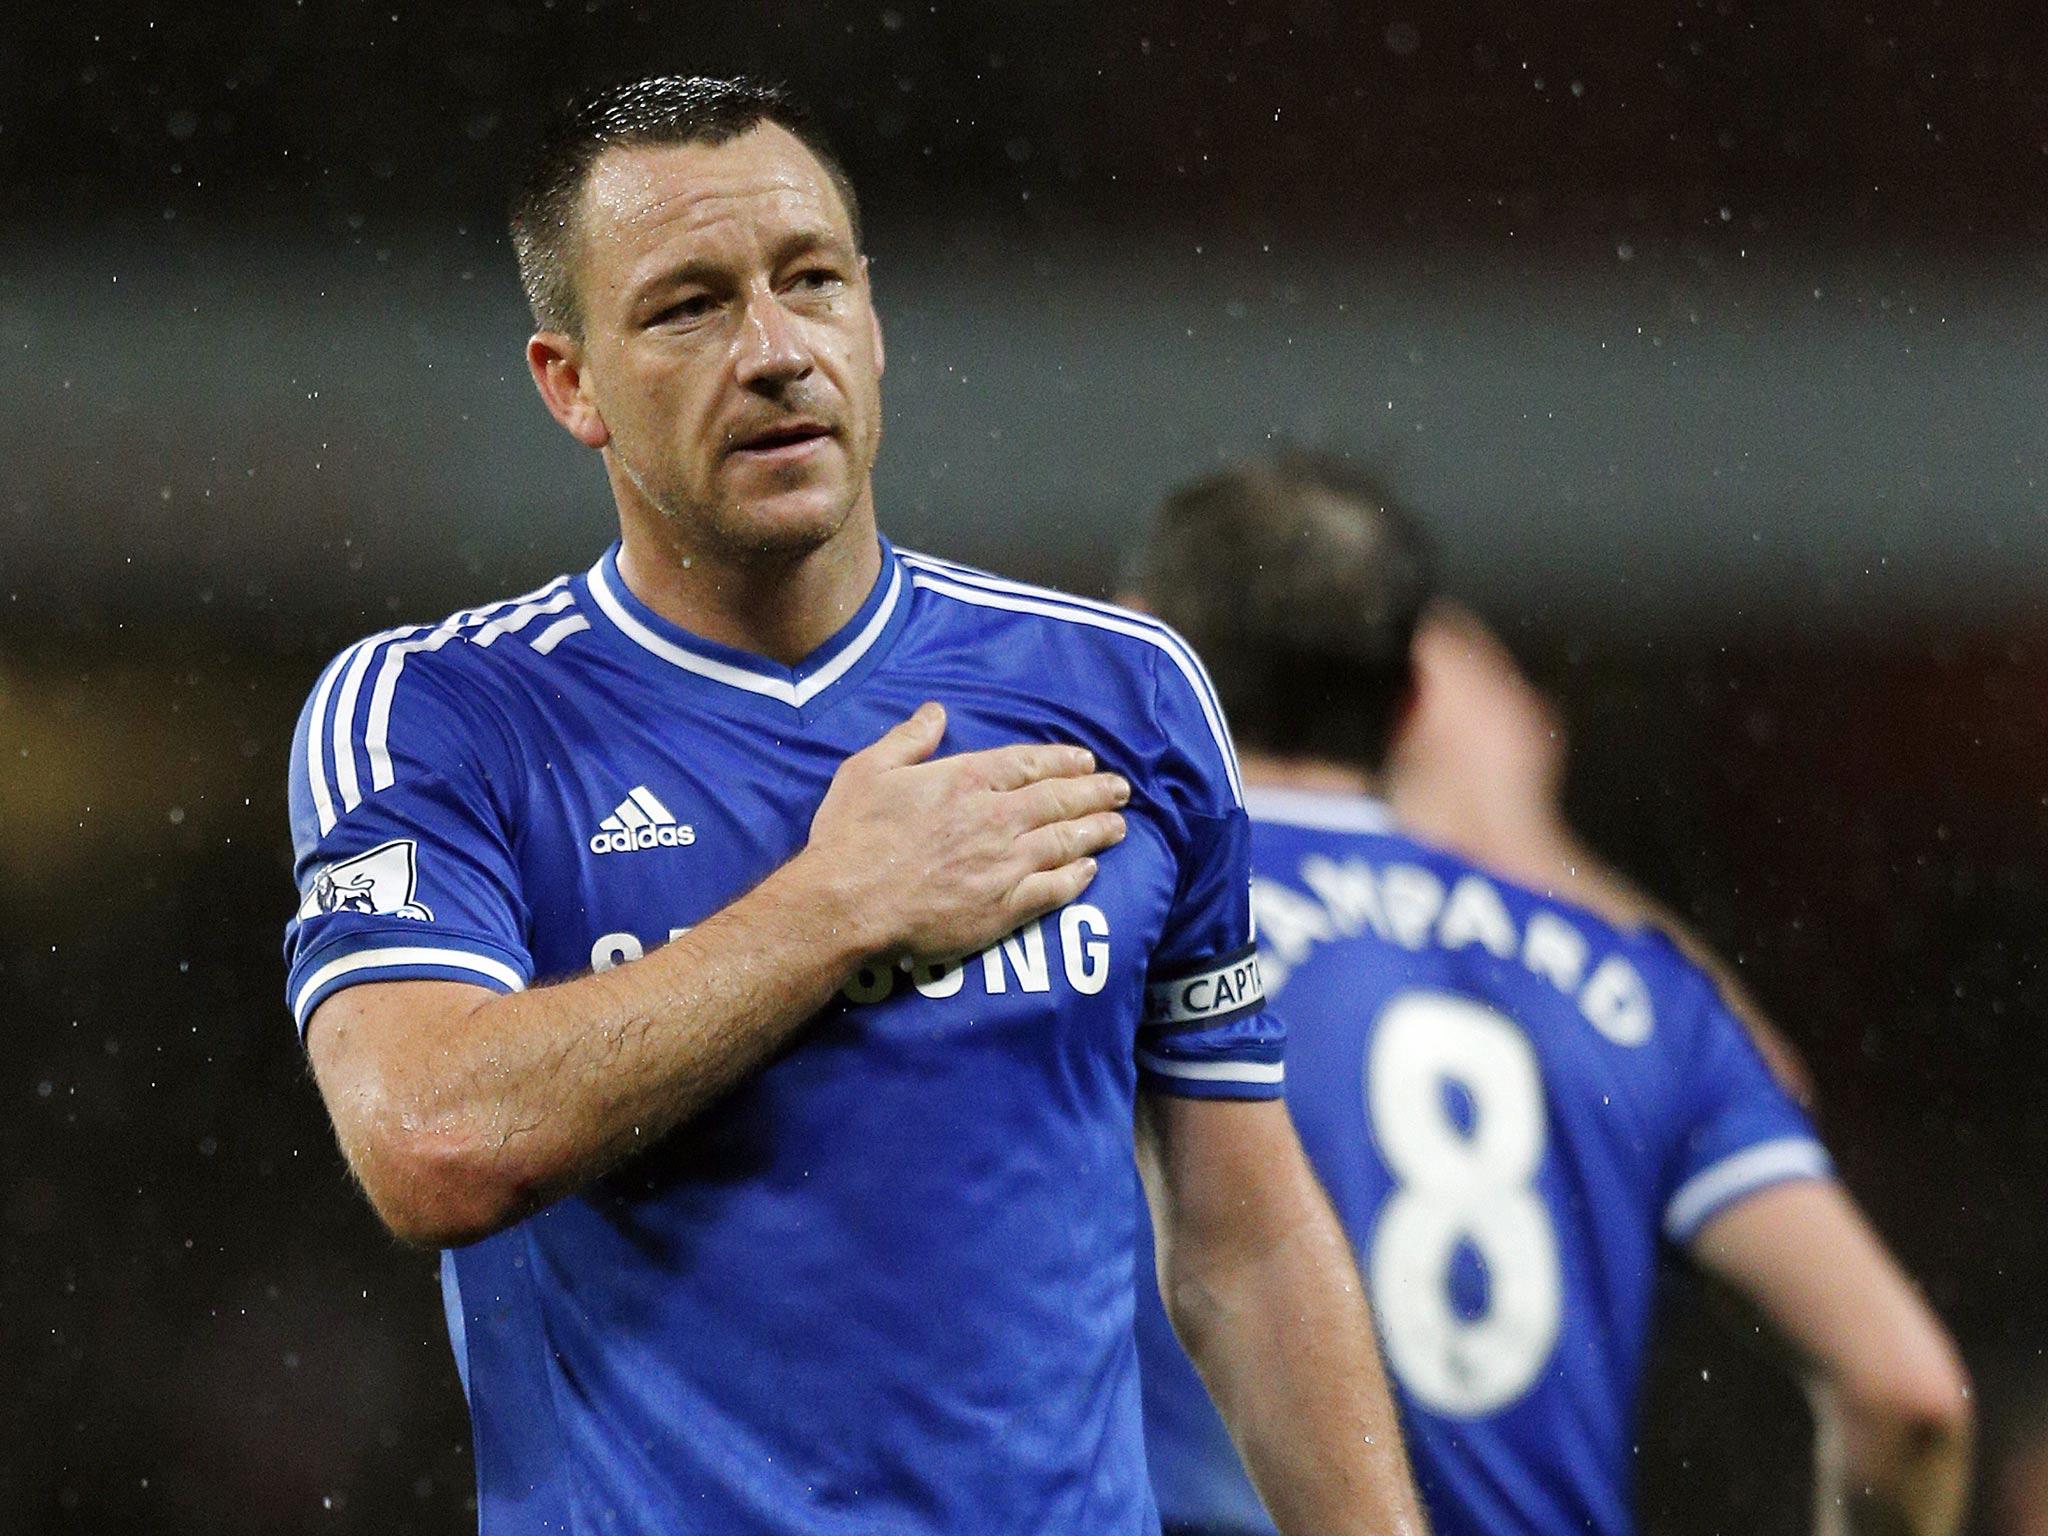 Chelsea v Swansea: John Terry eyes Chelsea 'pulling away from